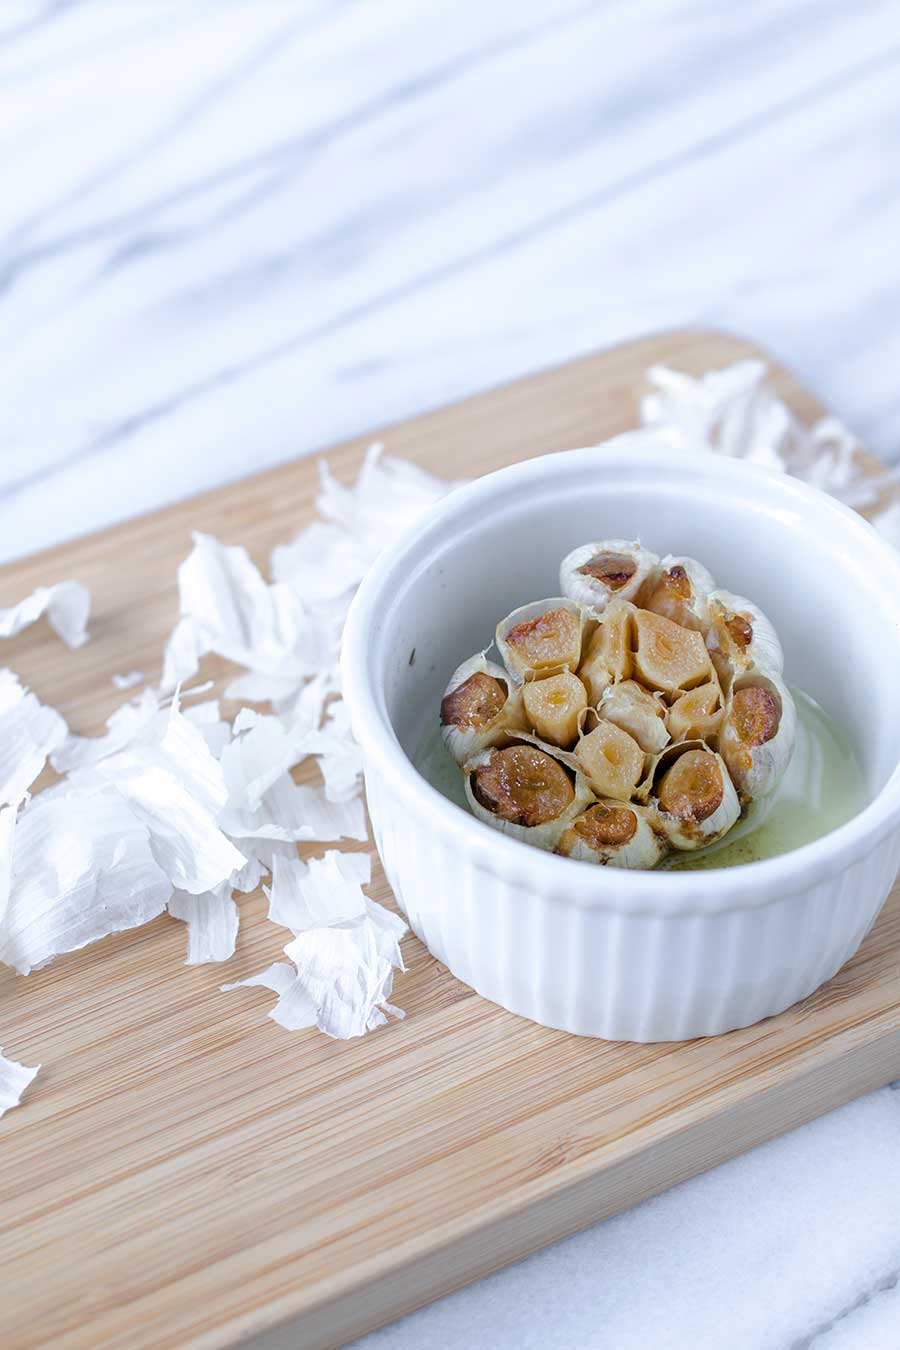 A photo of roasted garlic in a ramekin